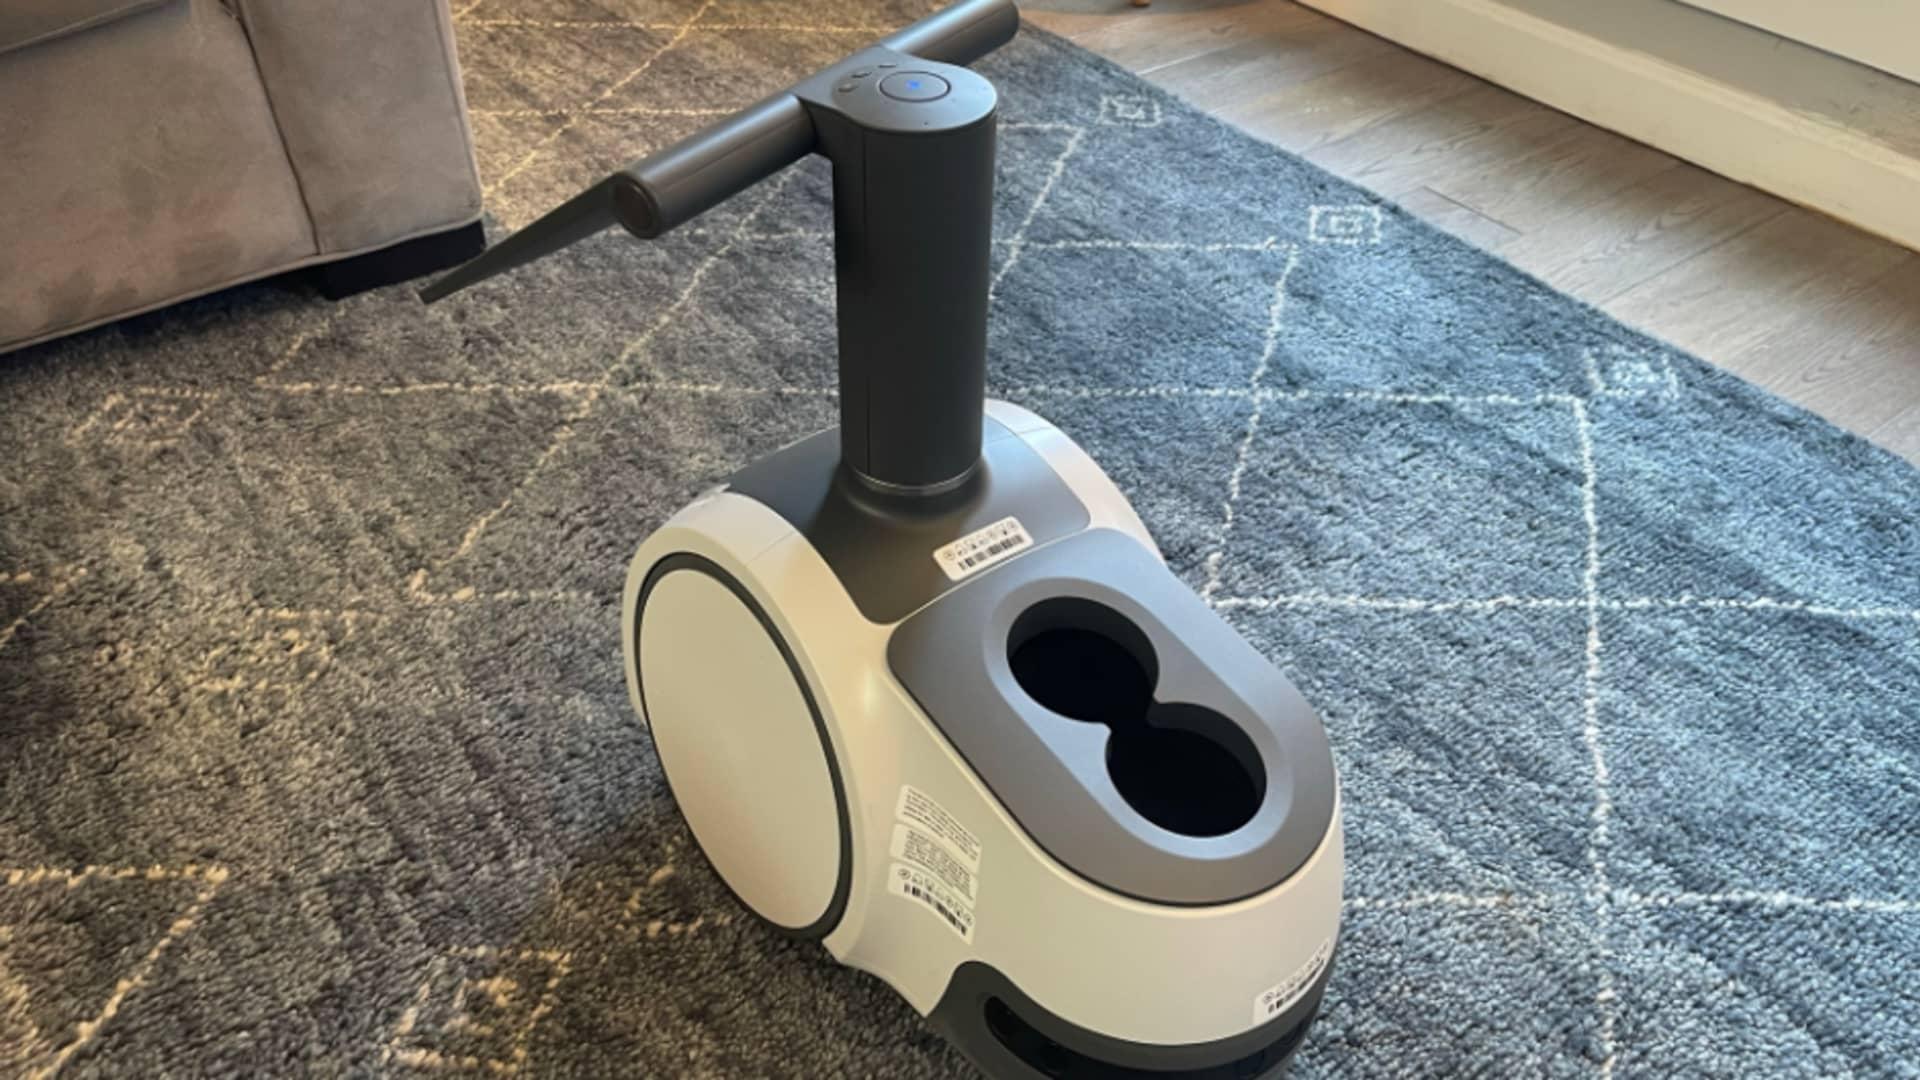 Amazon Astro home robot